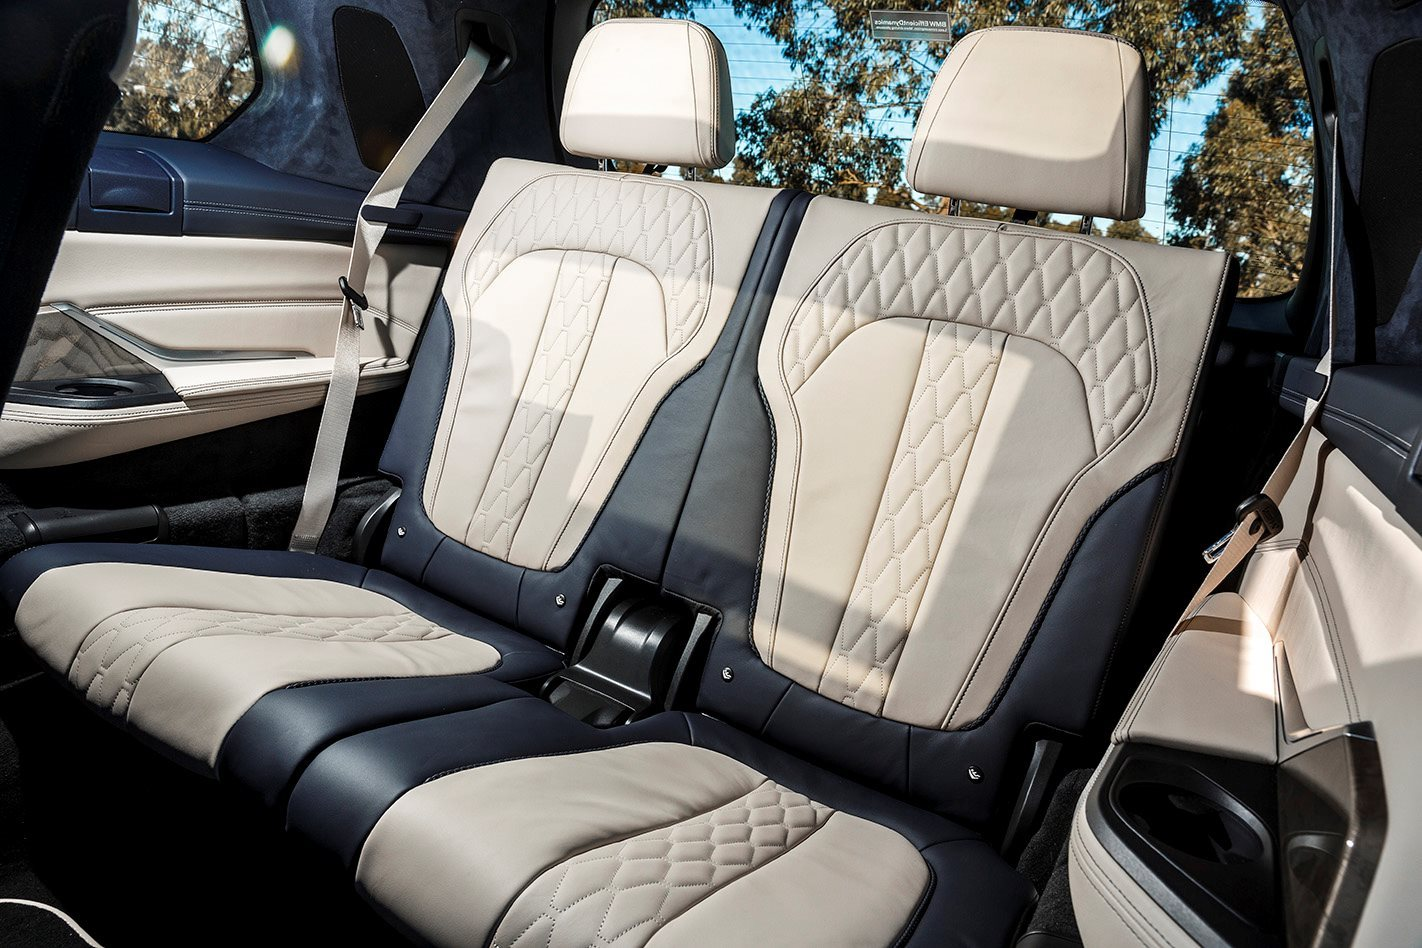 2019 Bmw X7 Xdrive30d Review Sprawling And Splendid